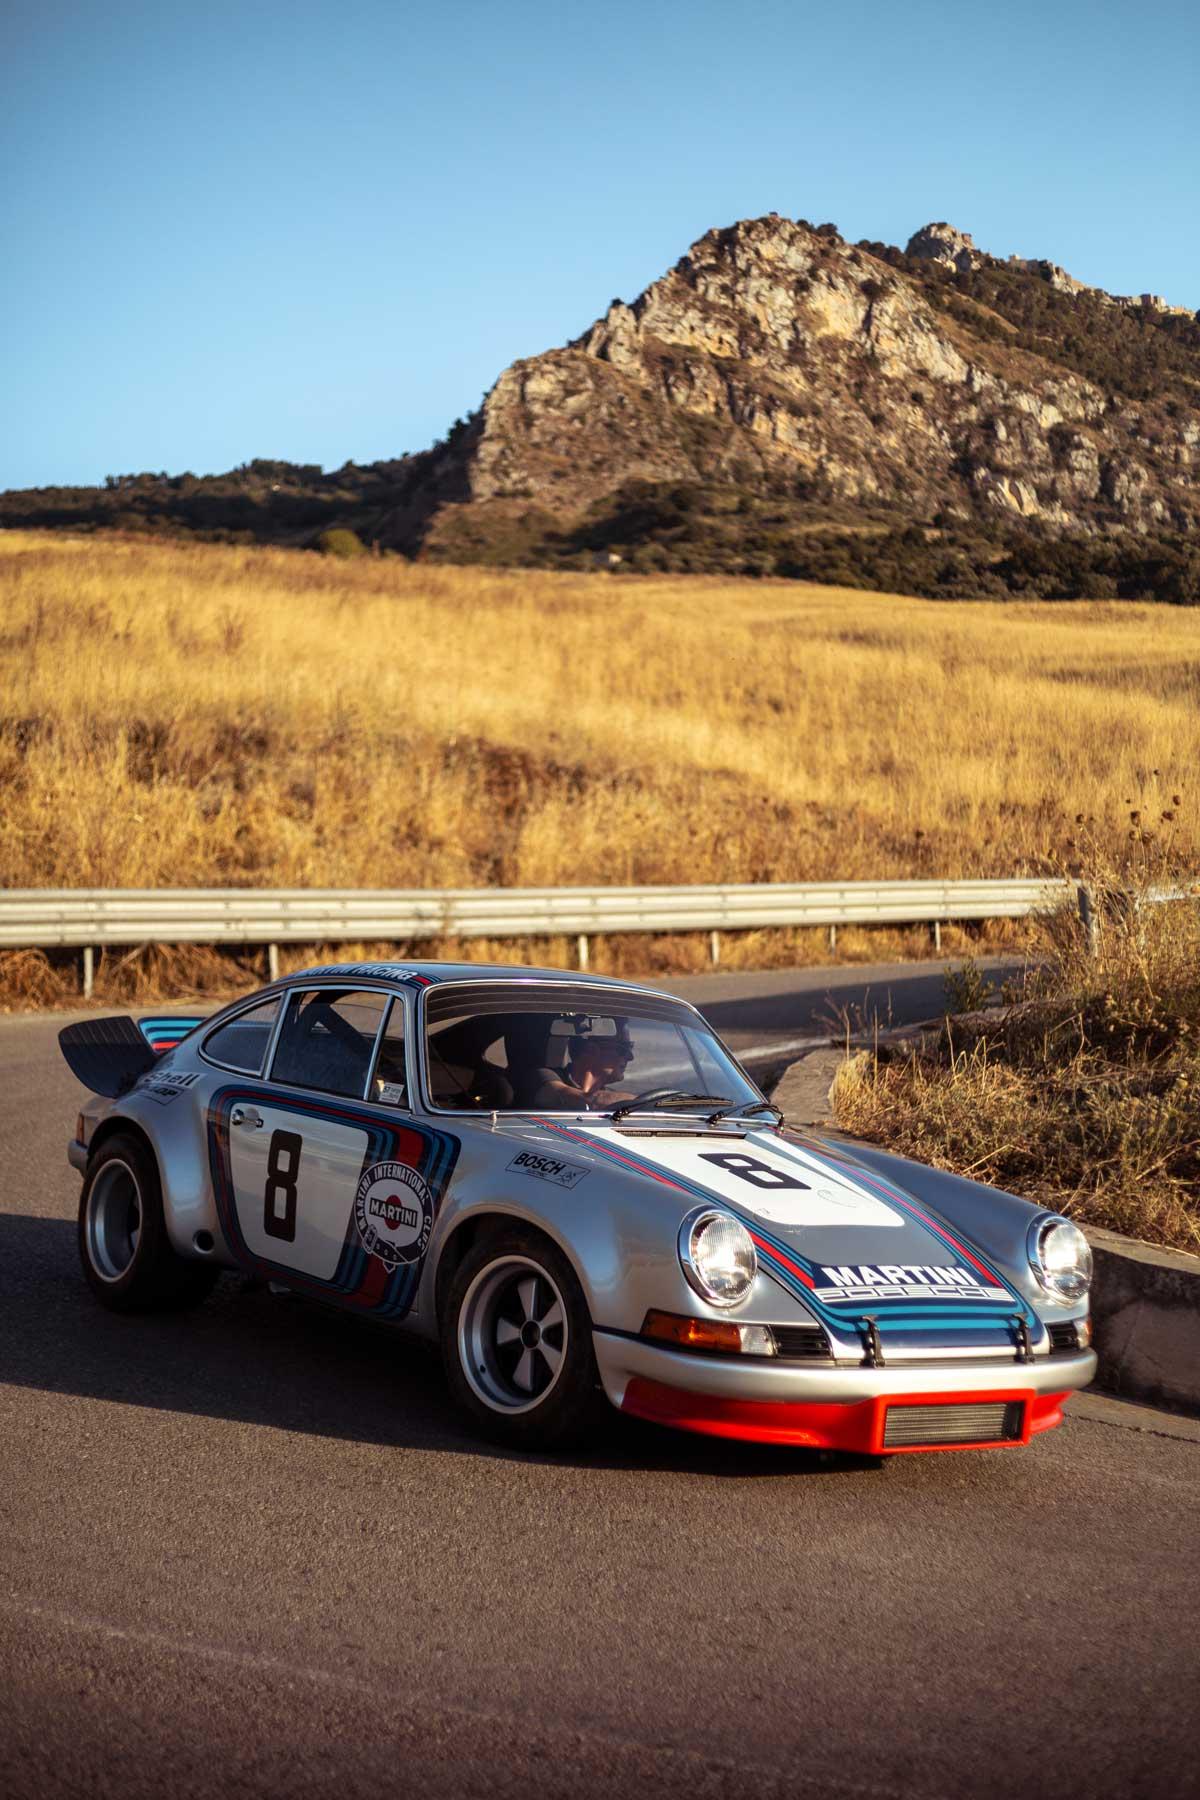 Targa Florio winning Martini Racing Porsche Carrera RSR (R6)